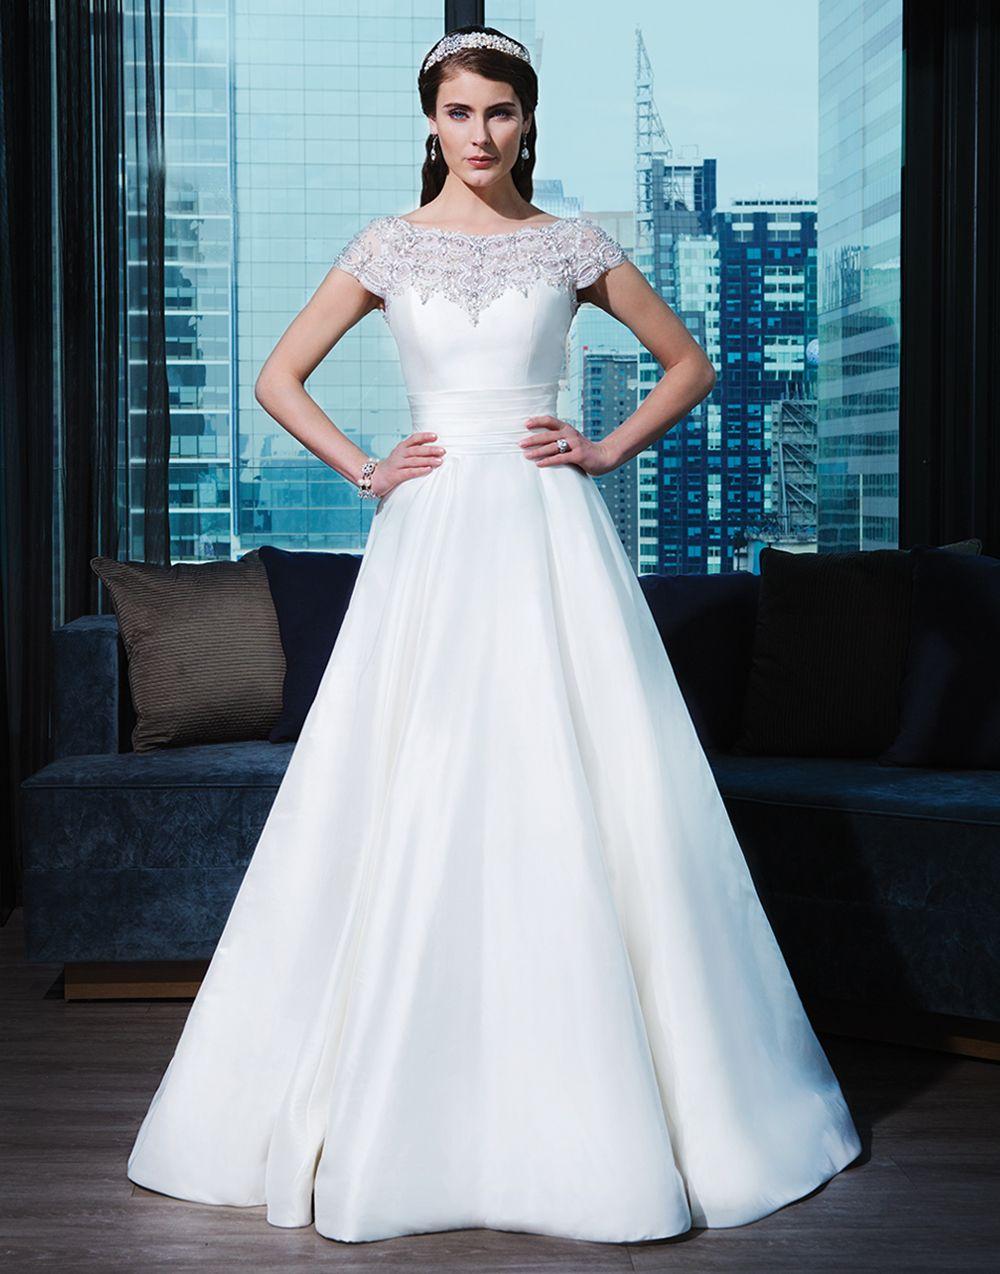 Justin Alexander signature wedding dresses style 9770 Silk dupion ...